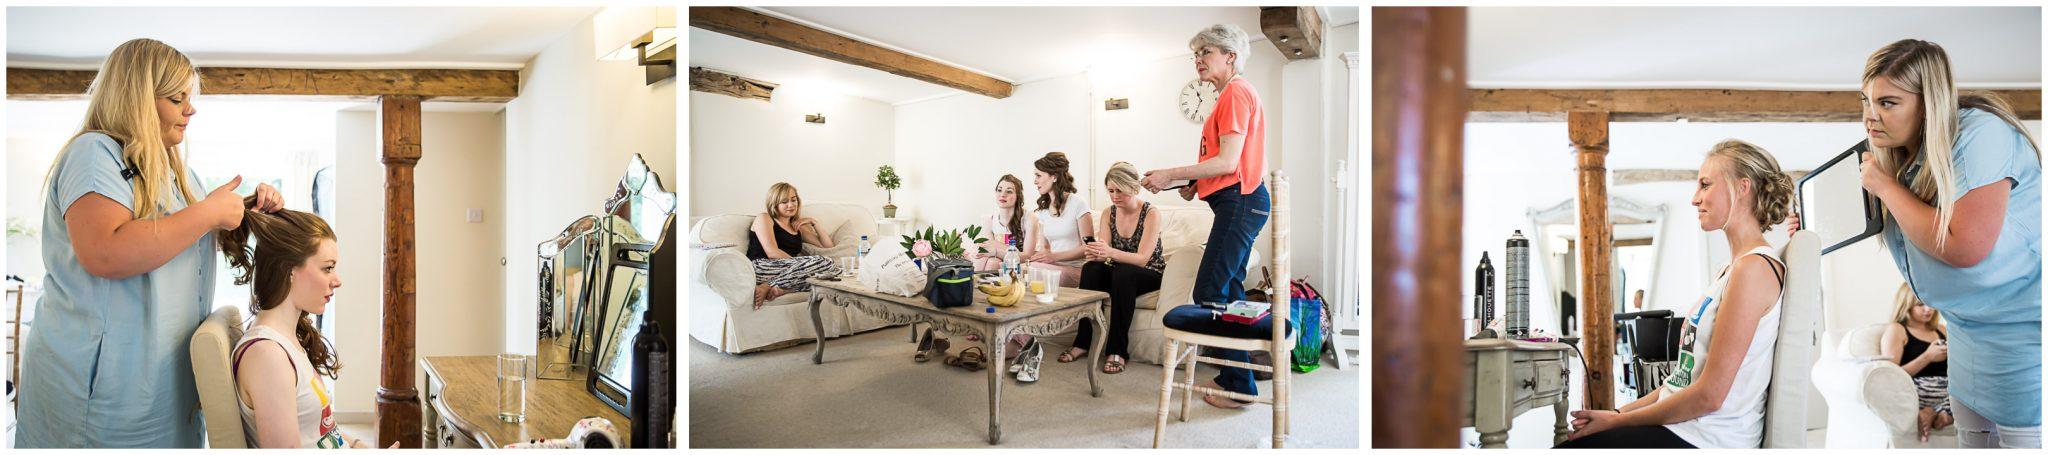 Sopley Mill Summer wedding bridesmaids getting ready in Avon Suite